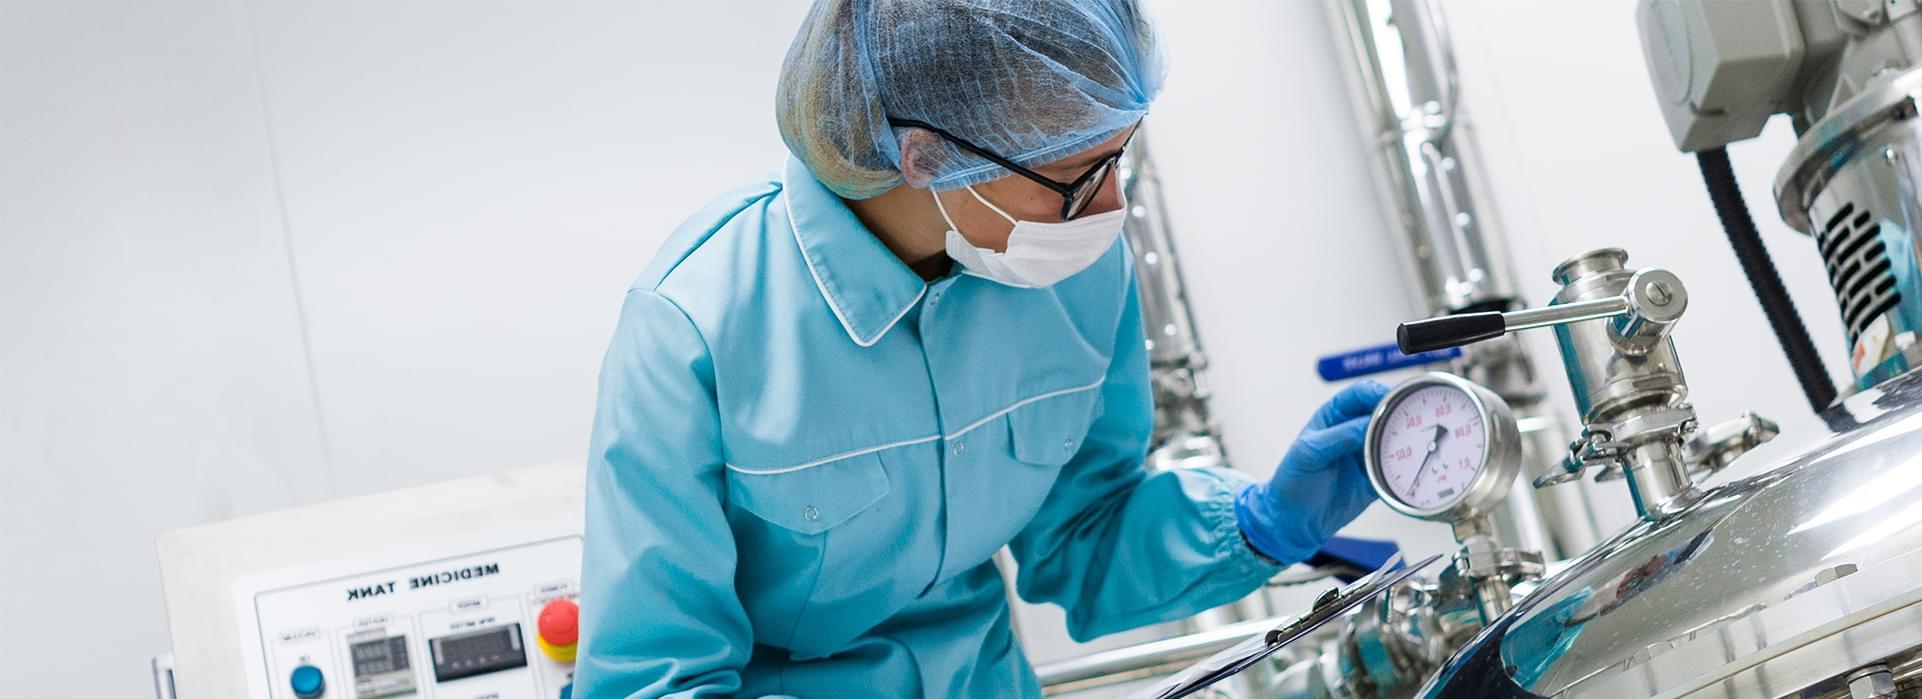 Women in mask working in laboratory